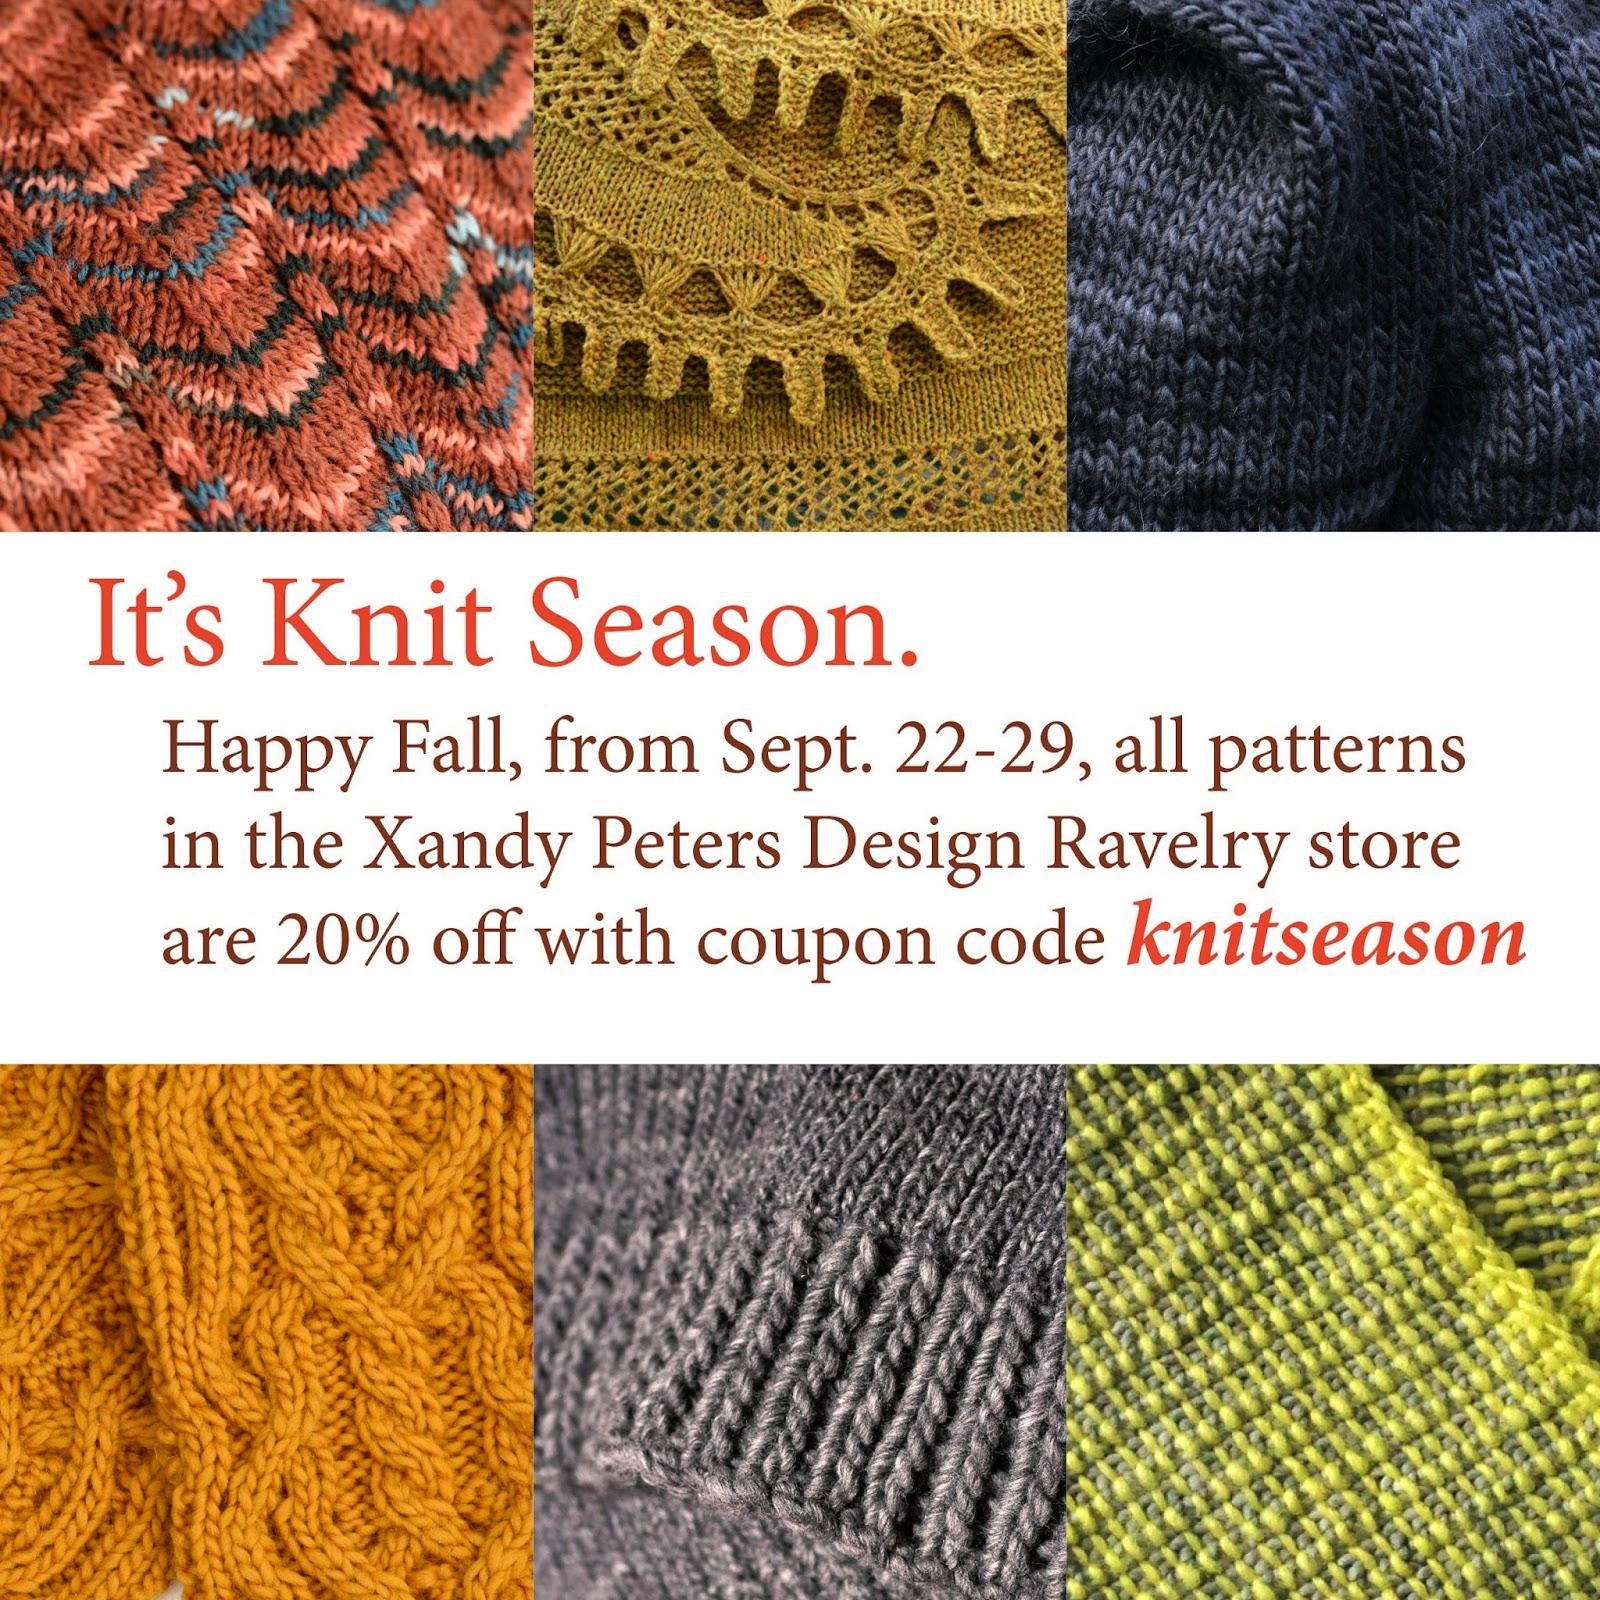 Knitting Universe Coupon Code : So i make stuff